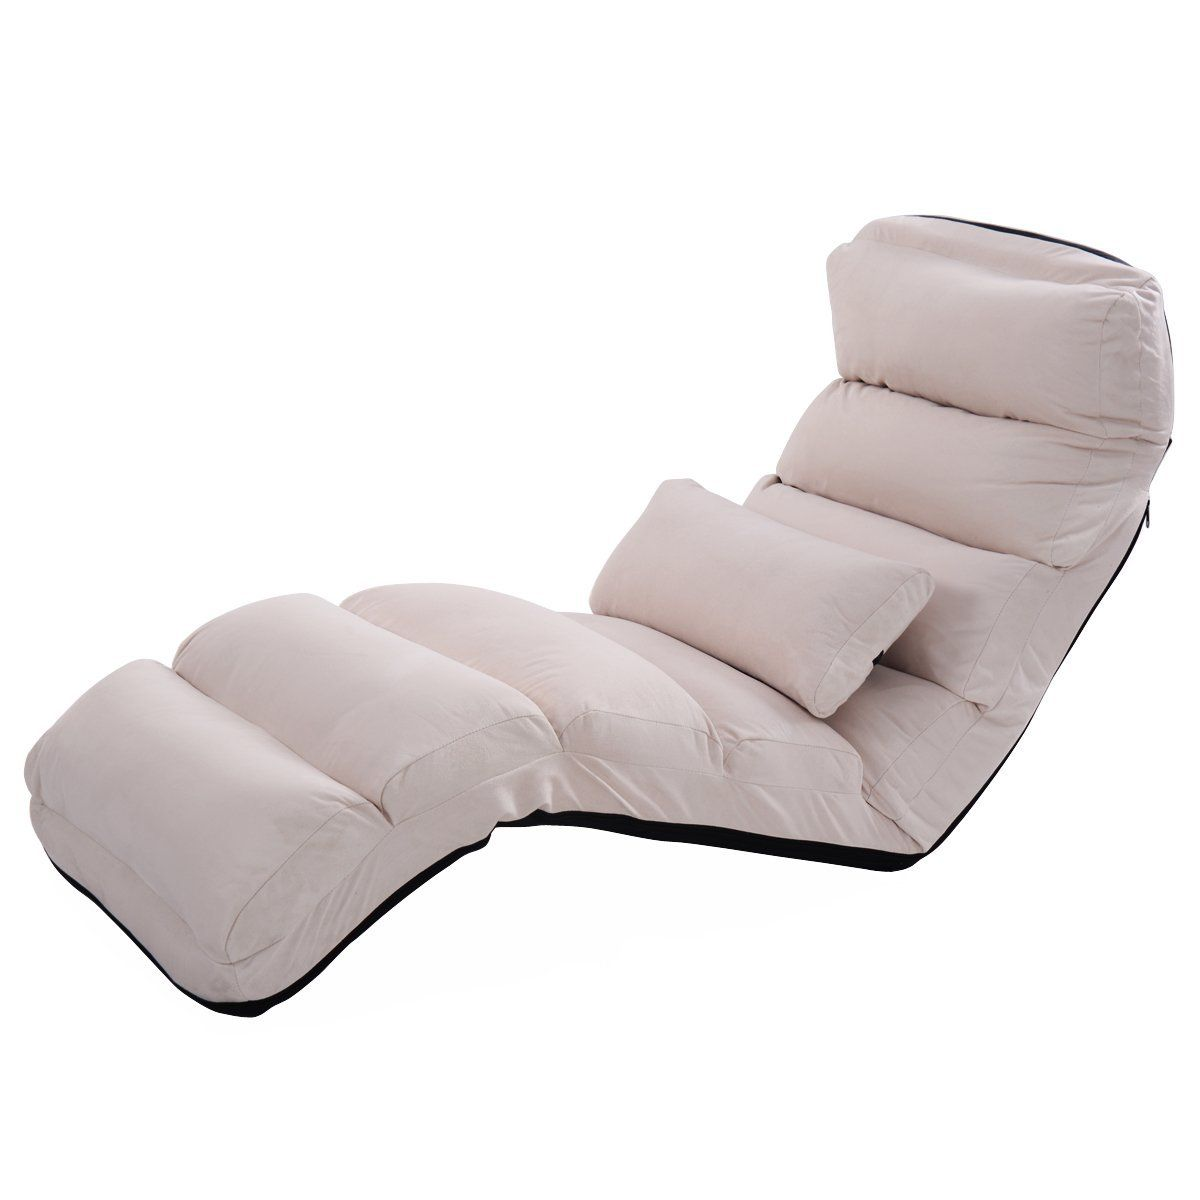 Brilliant Amazon Com Giantex Folding Lazy Sofa Chair Stylish Sofa Machost Co Dining Chair Design Ideas Machostcouk